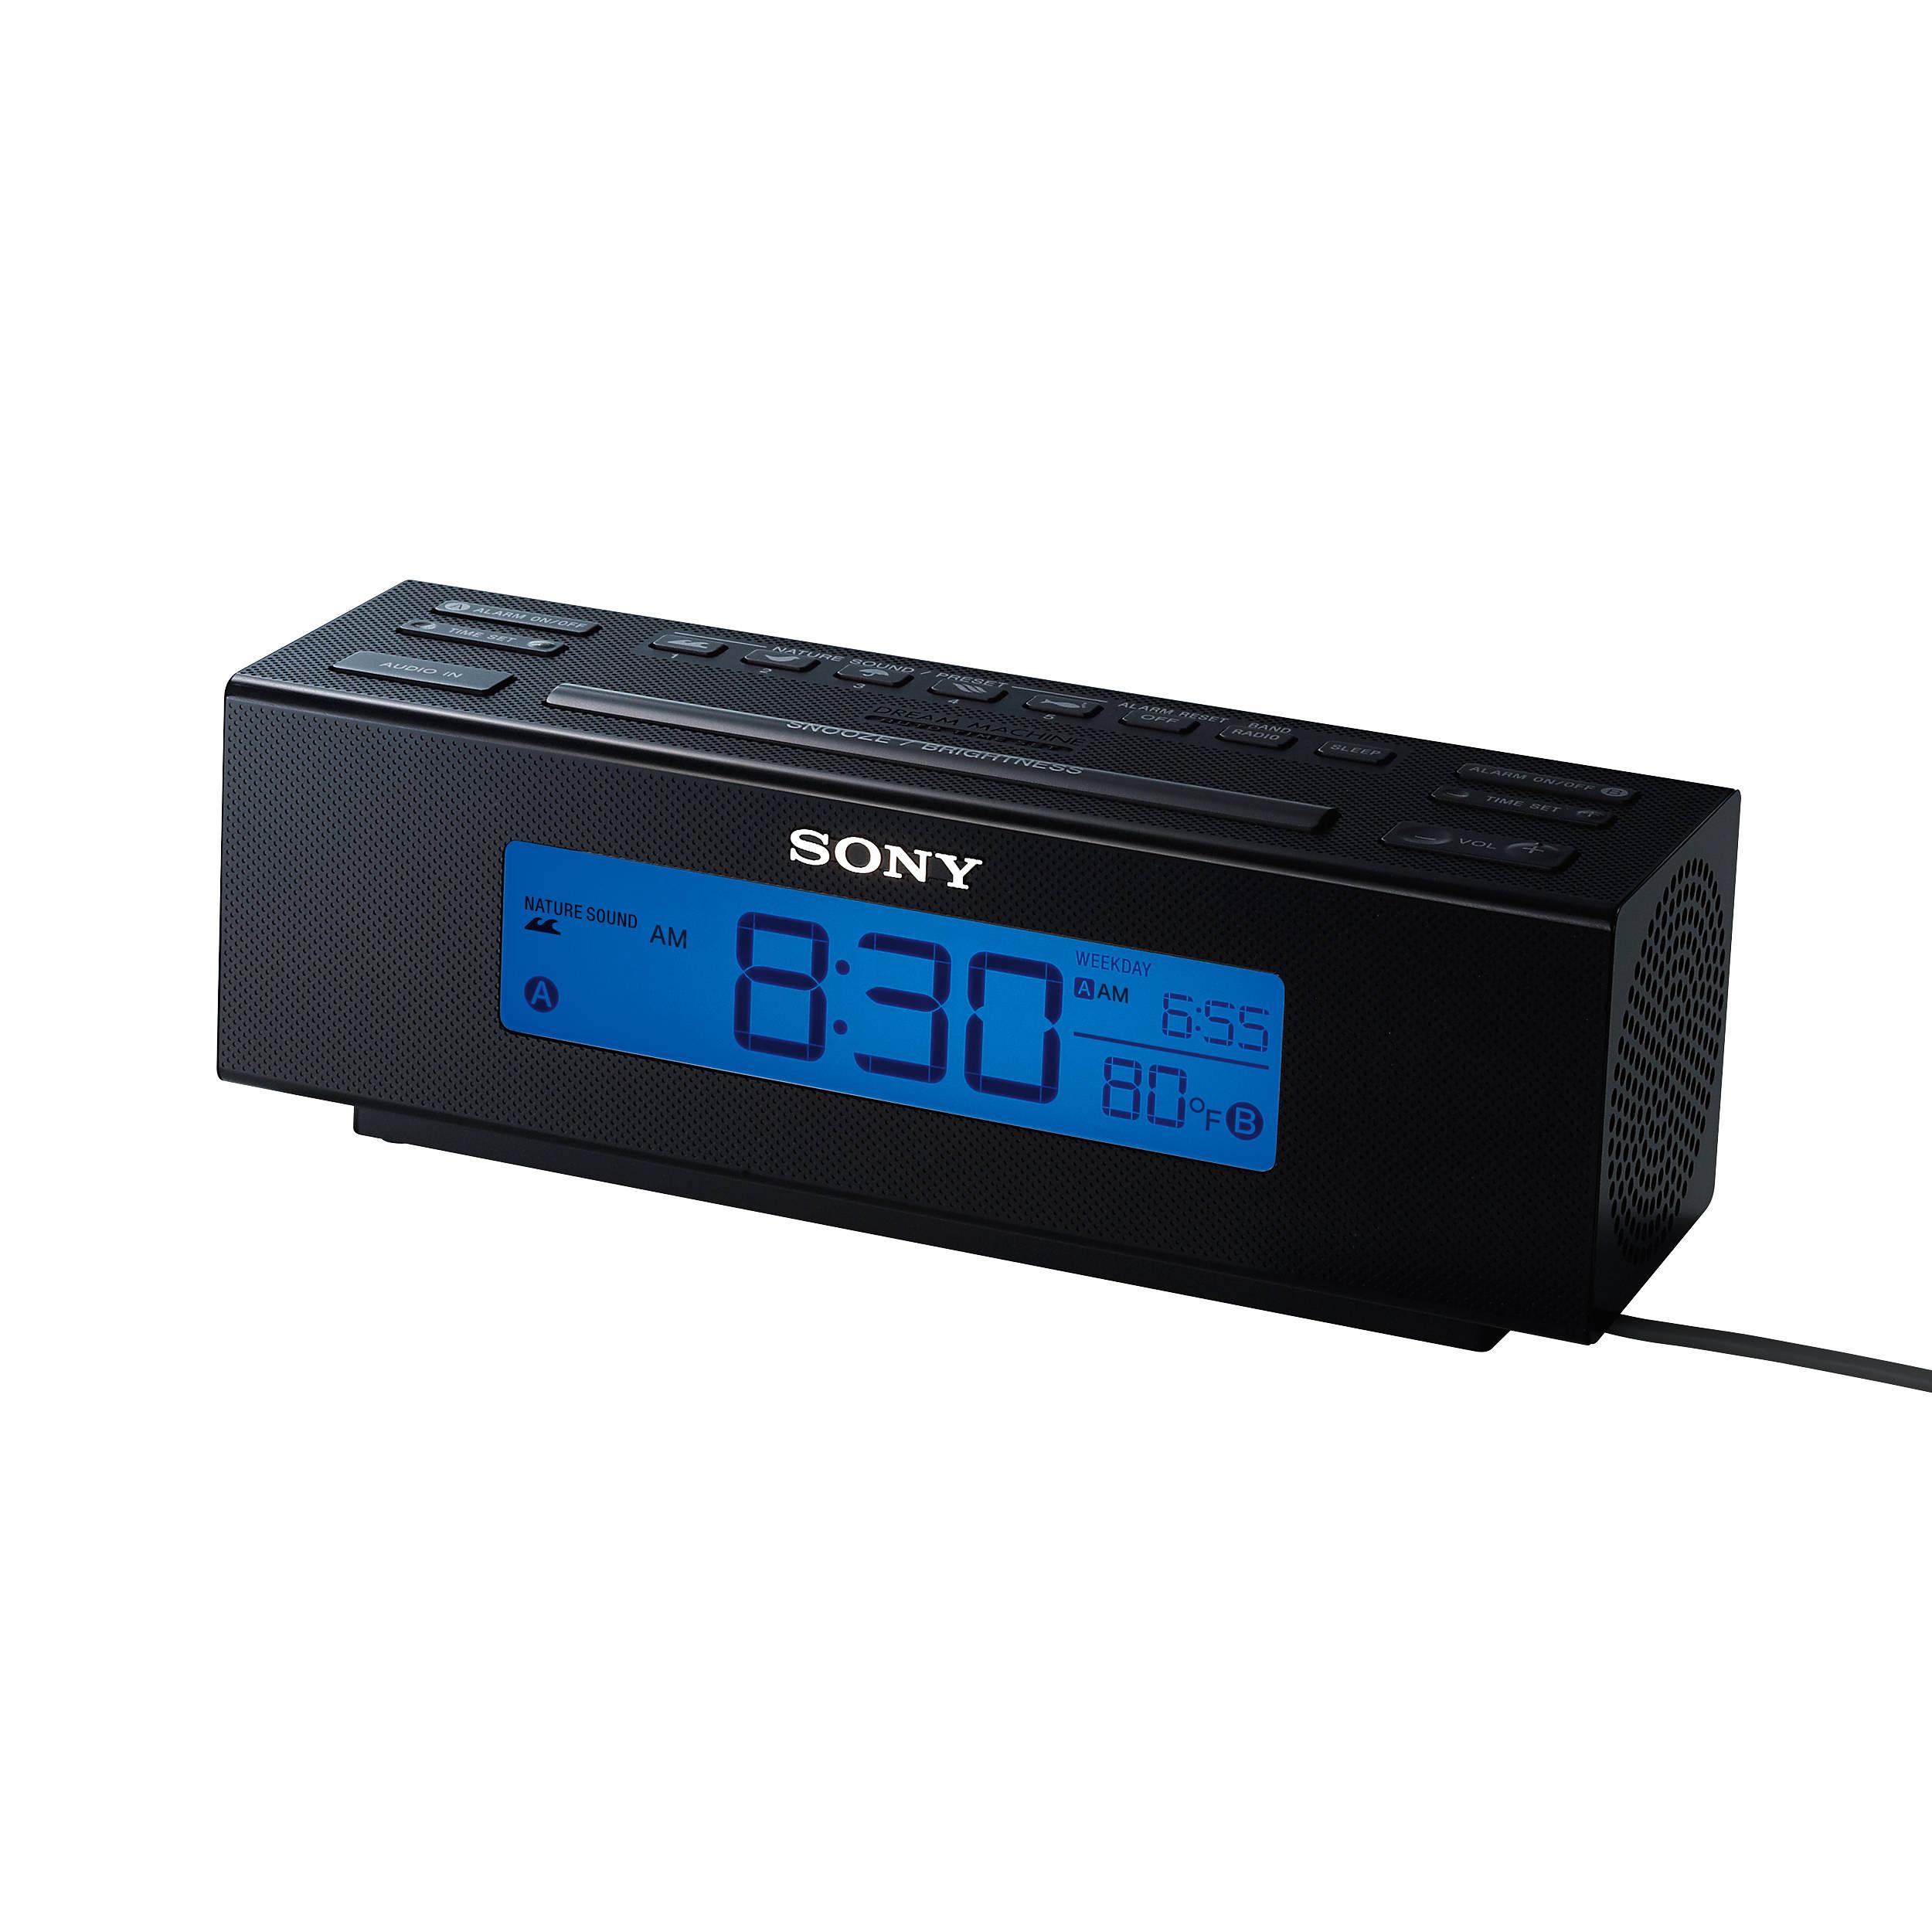 sony icf c707 clock radio icf c707 b h photo video rh bhphotovideo com Manual Sony Dream Machine ICF- C318 Sony Model ICF-C707